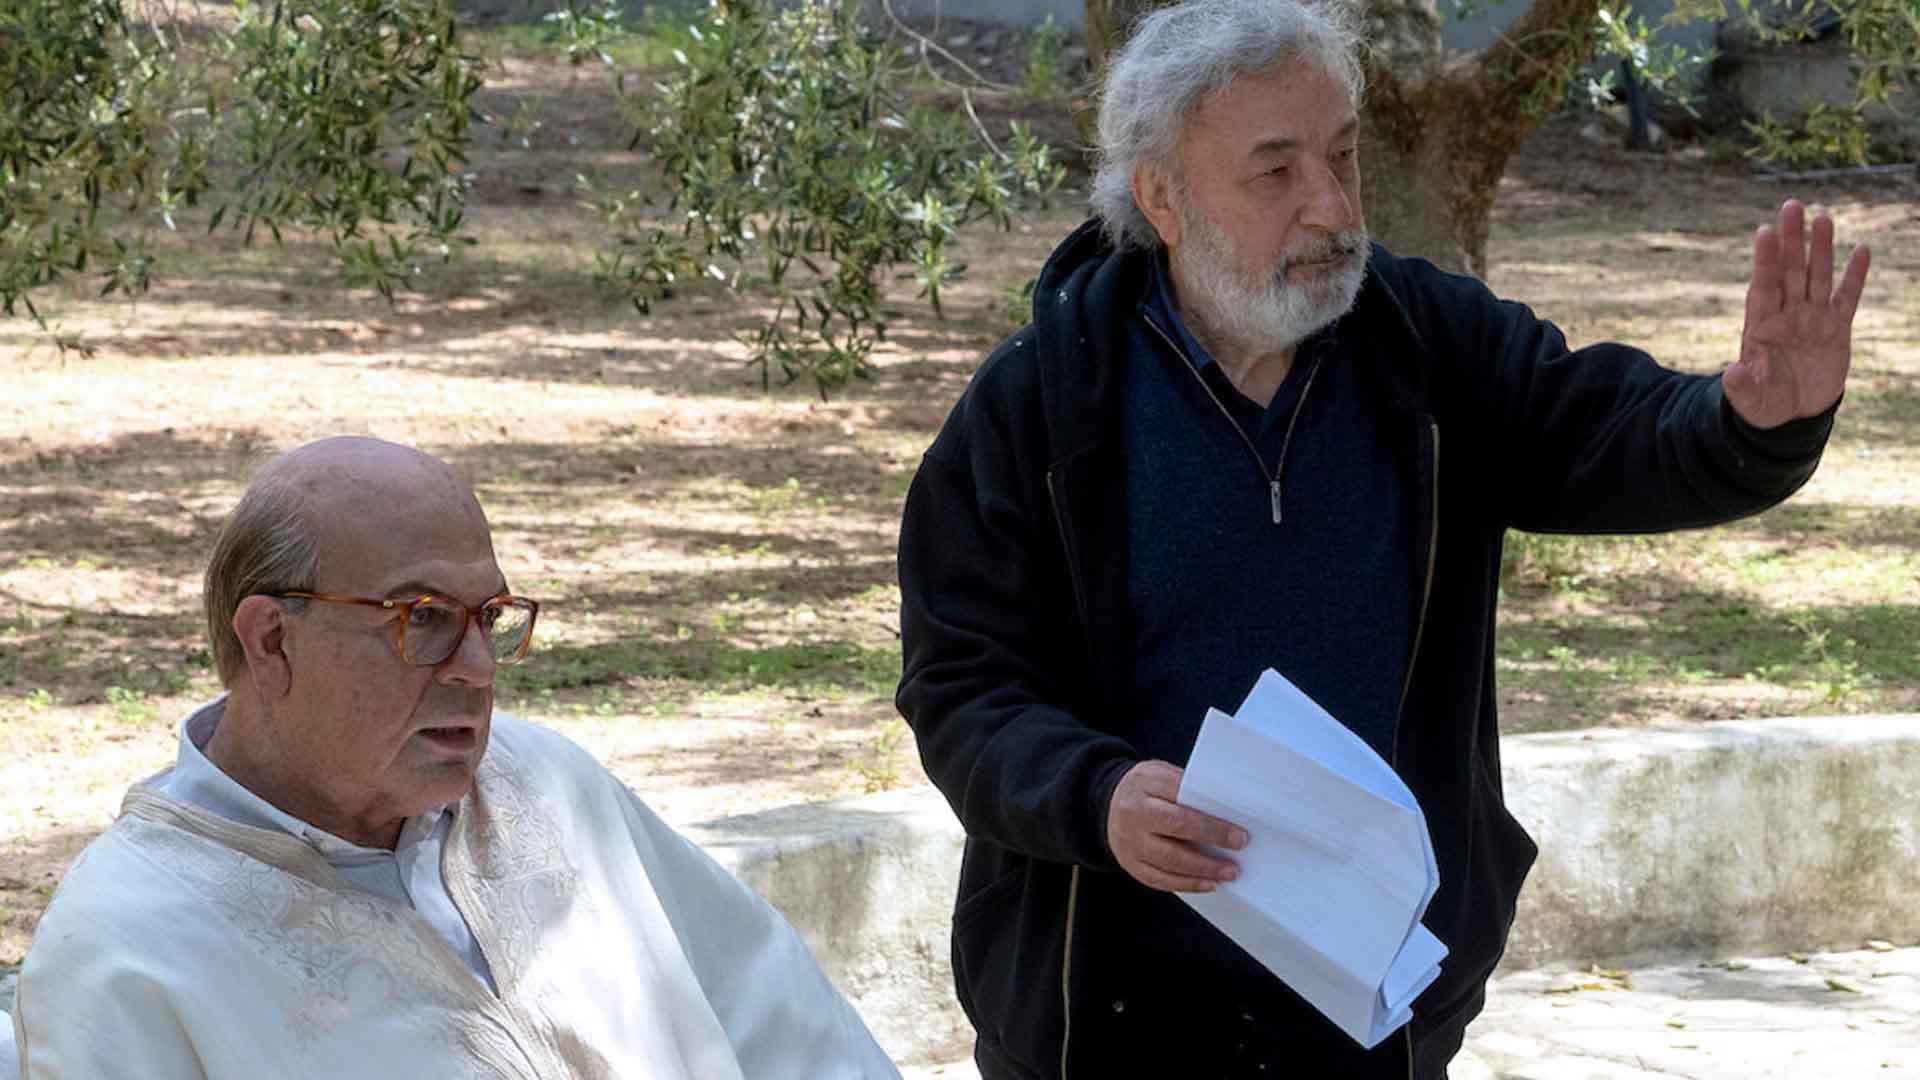 Gianni Amelio e Pierfrancesco Favino sul set di Hammamet